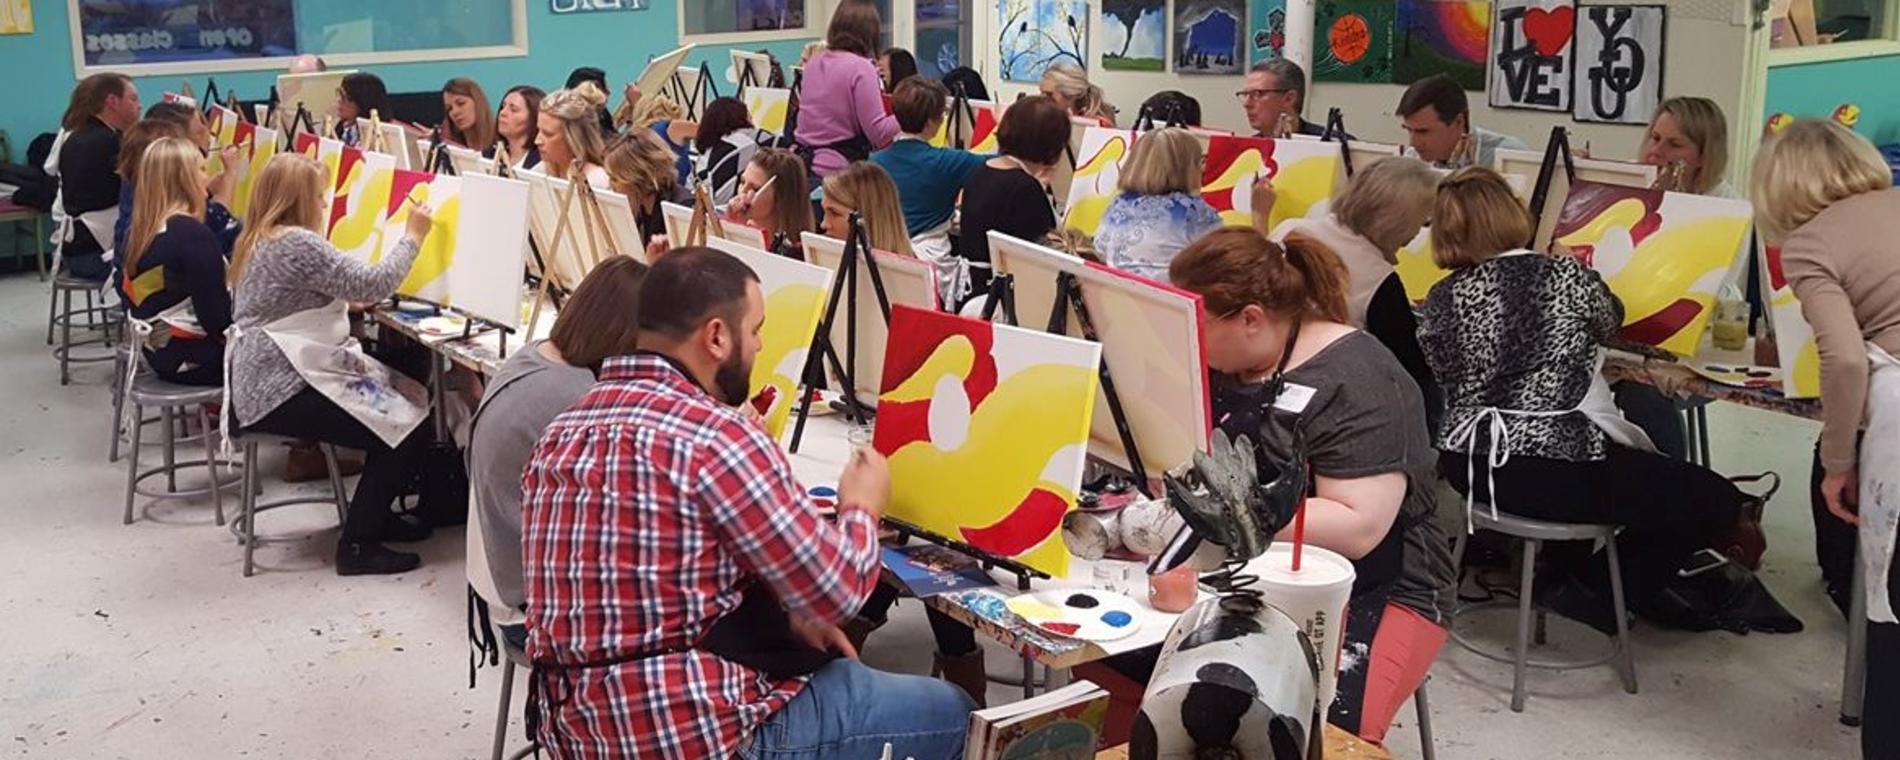 Paint the Towne Red Yellow Swirls Visit Wichita